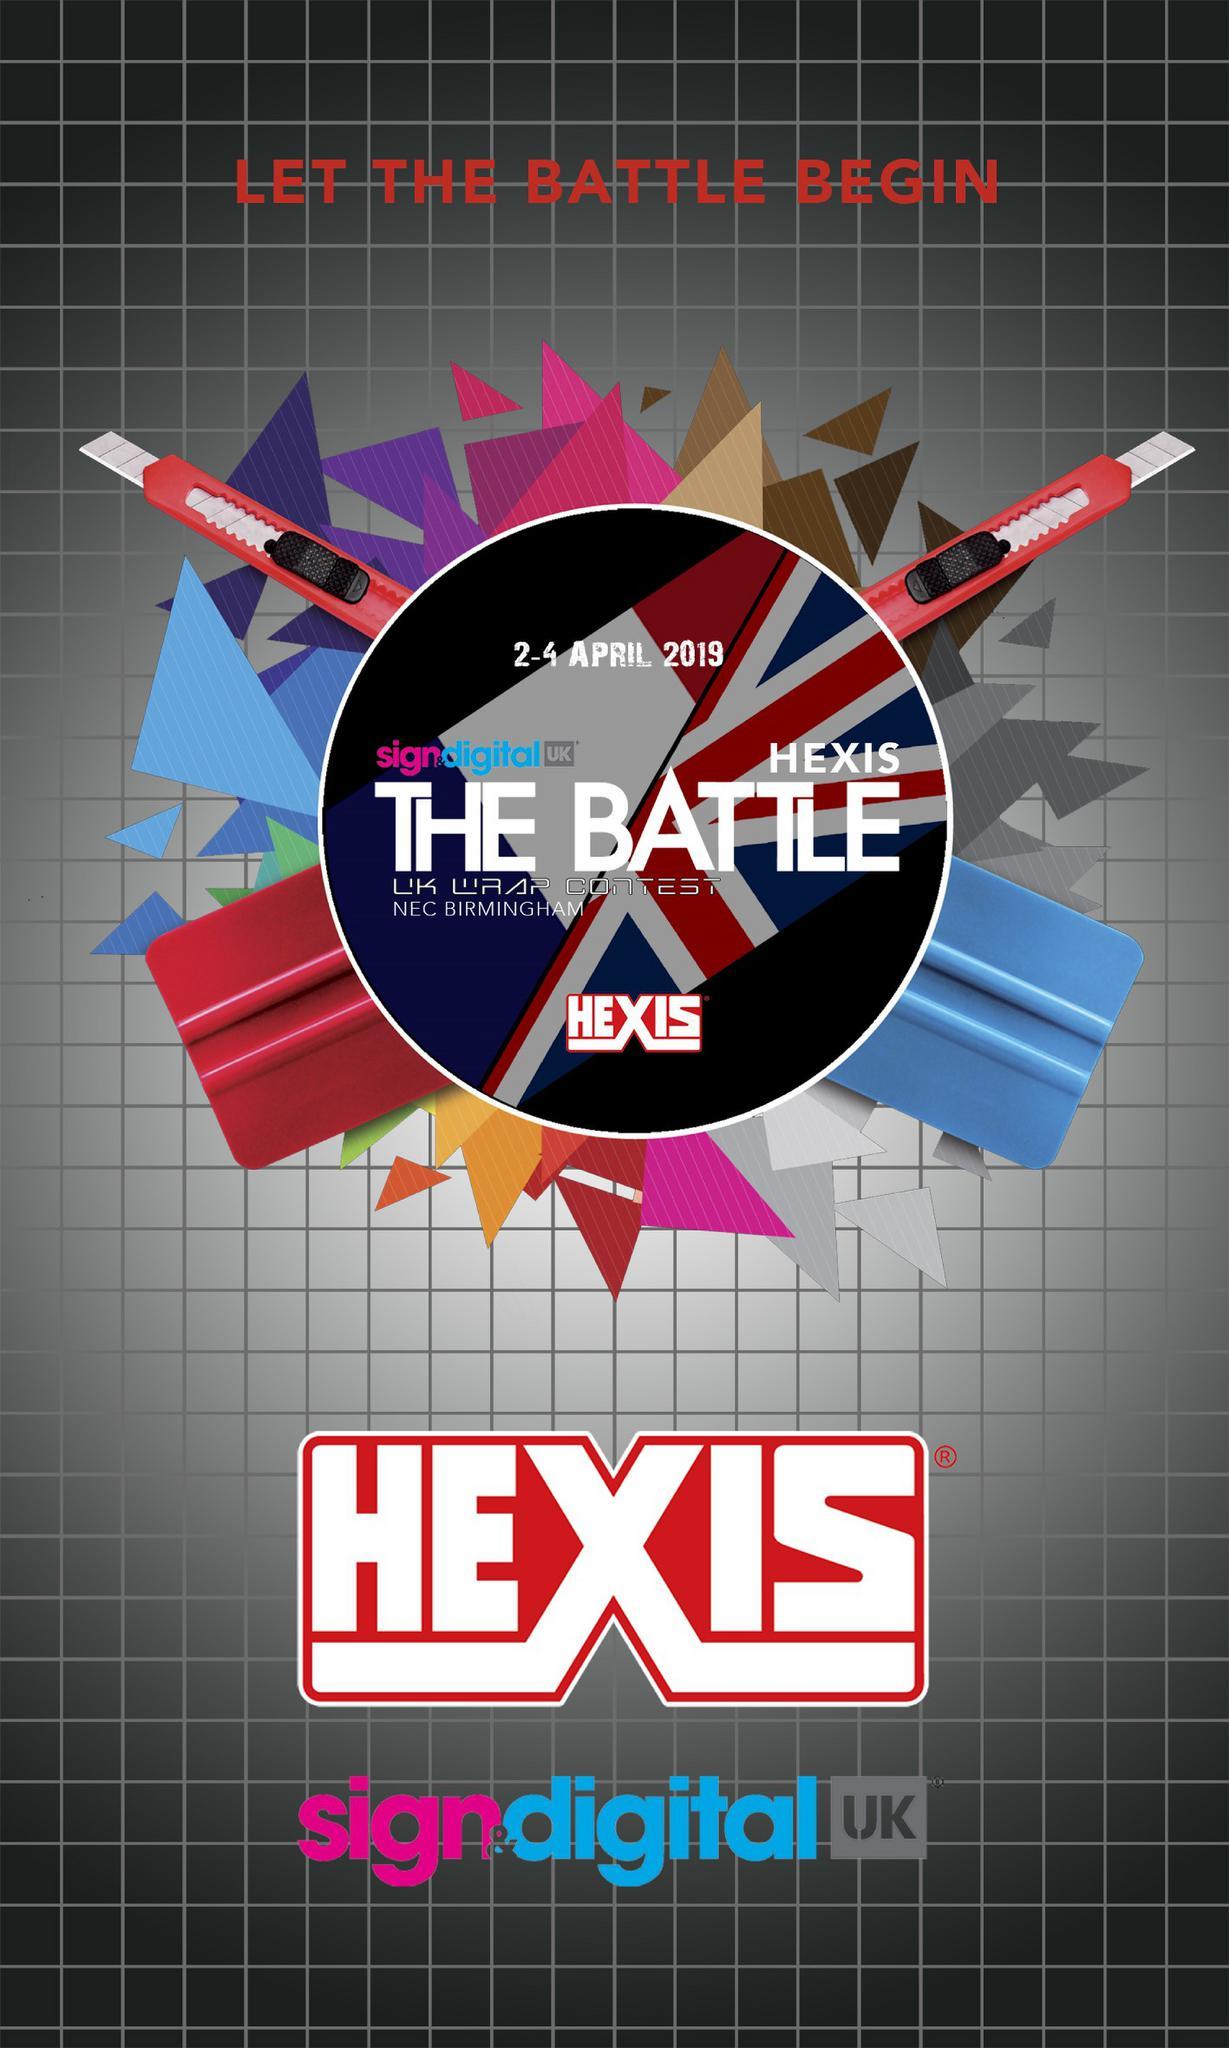 D Printing Exhibition Nec : Hexis battle sign digital signage print display